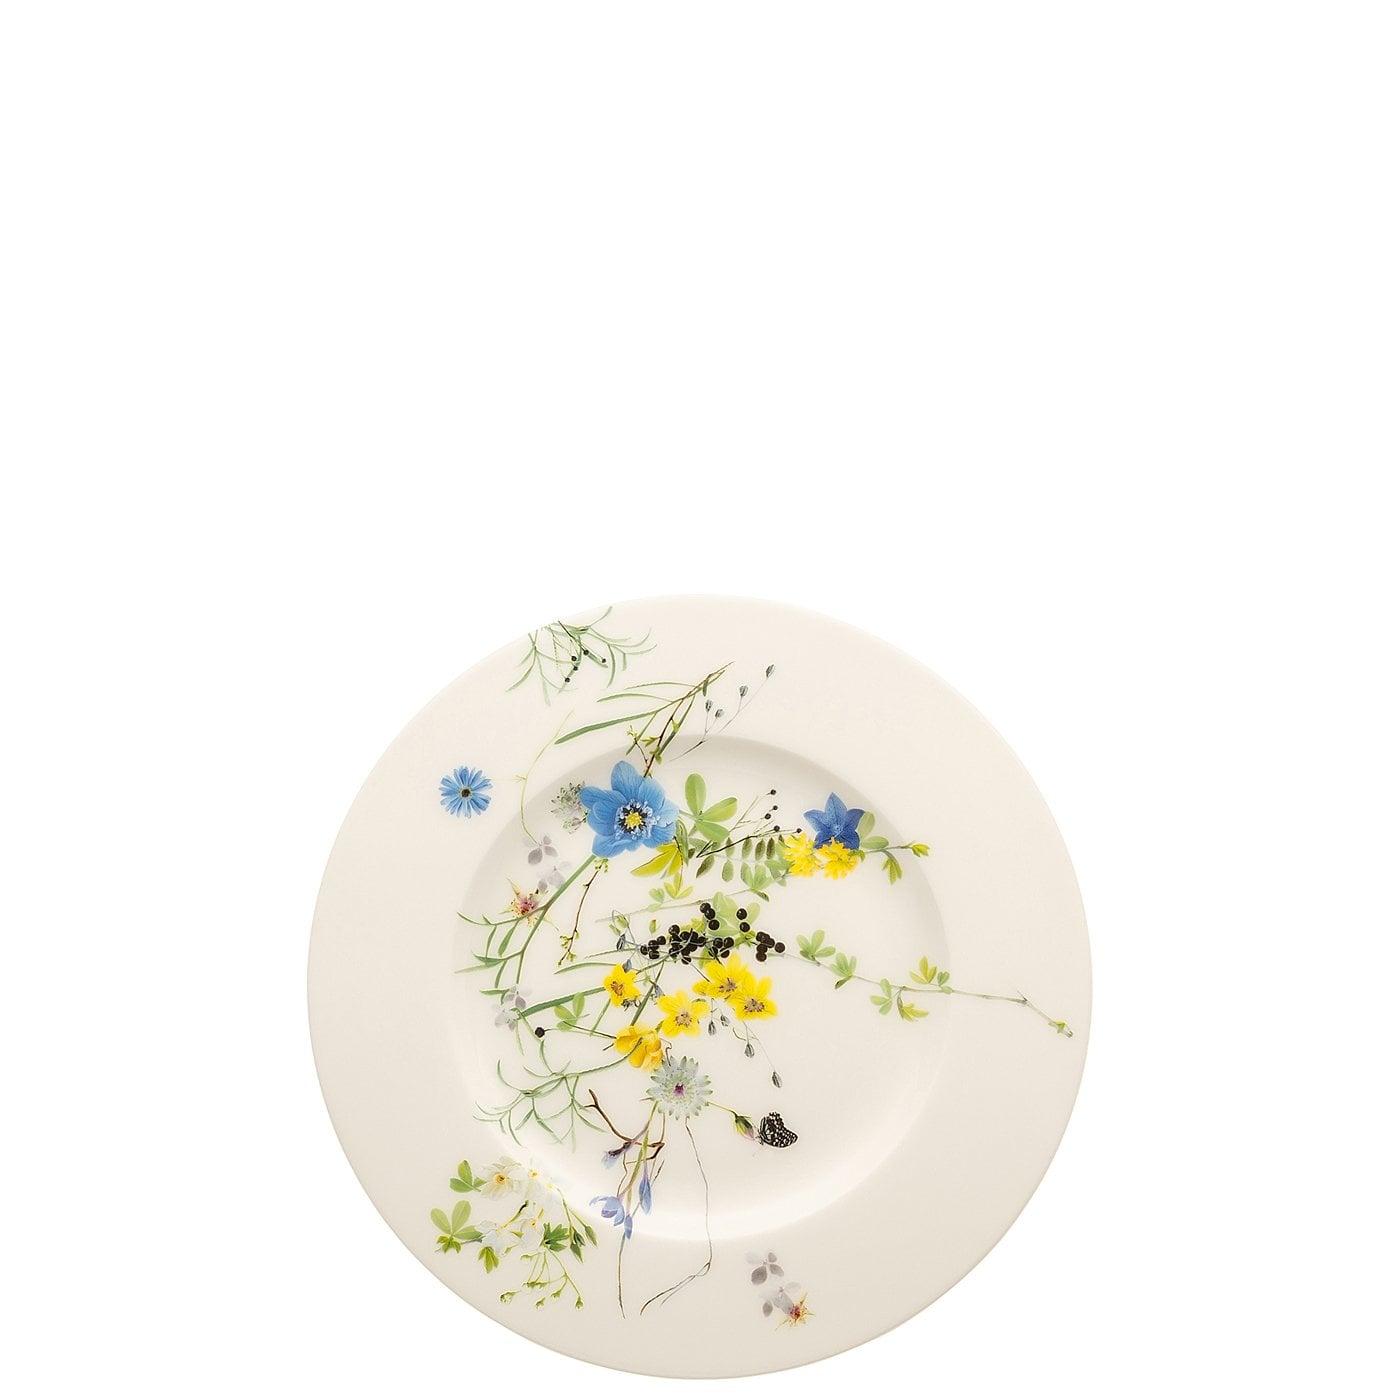 rosenthal brillance fleurs des alpes fruehstuecksteller 19 cm fahne 1 w1400 center